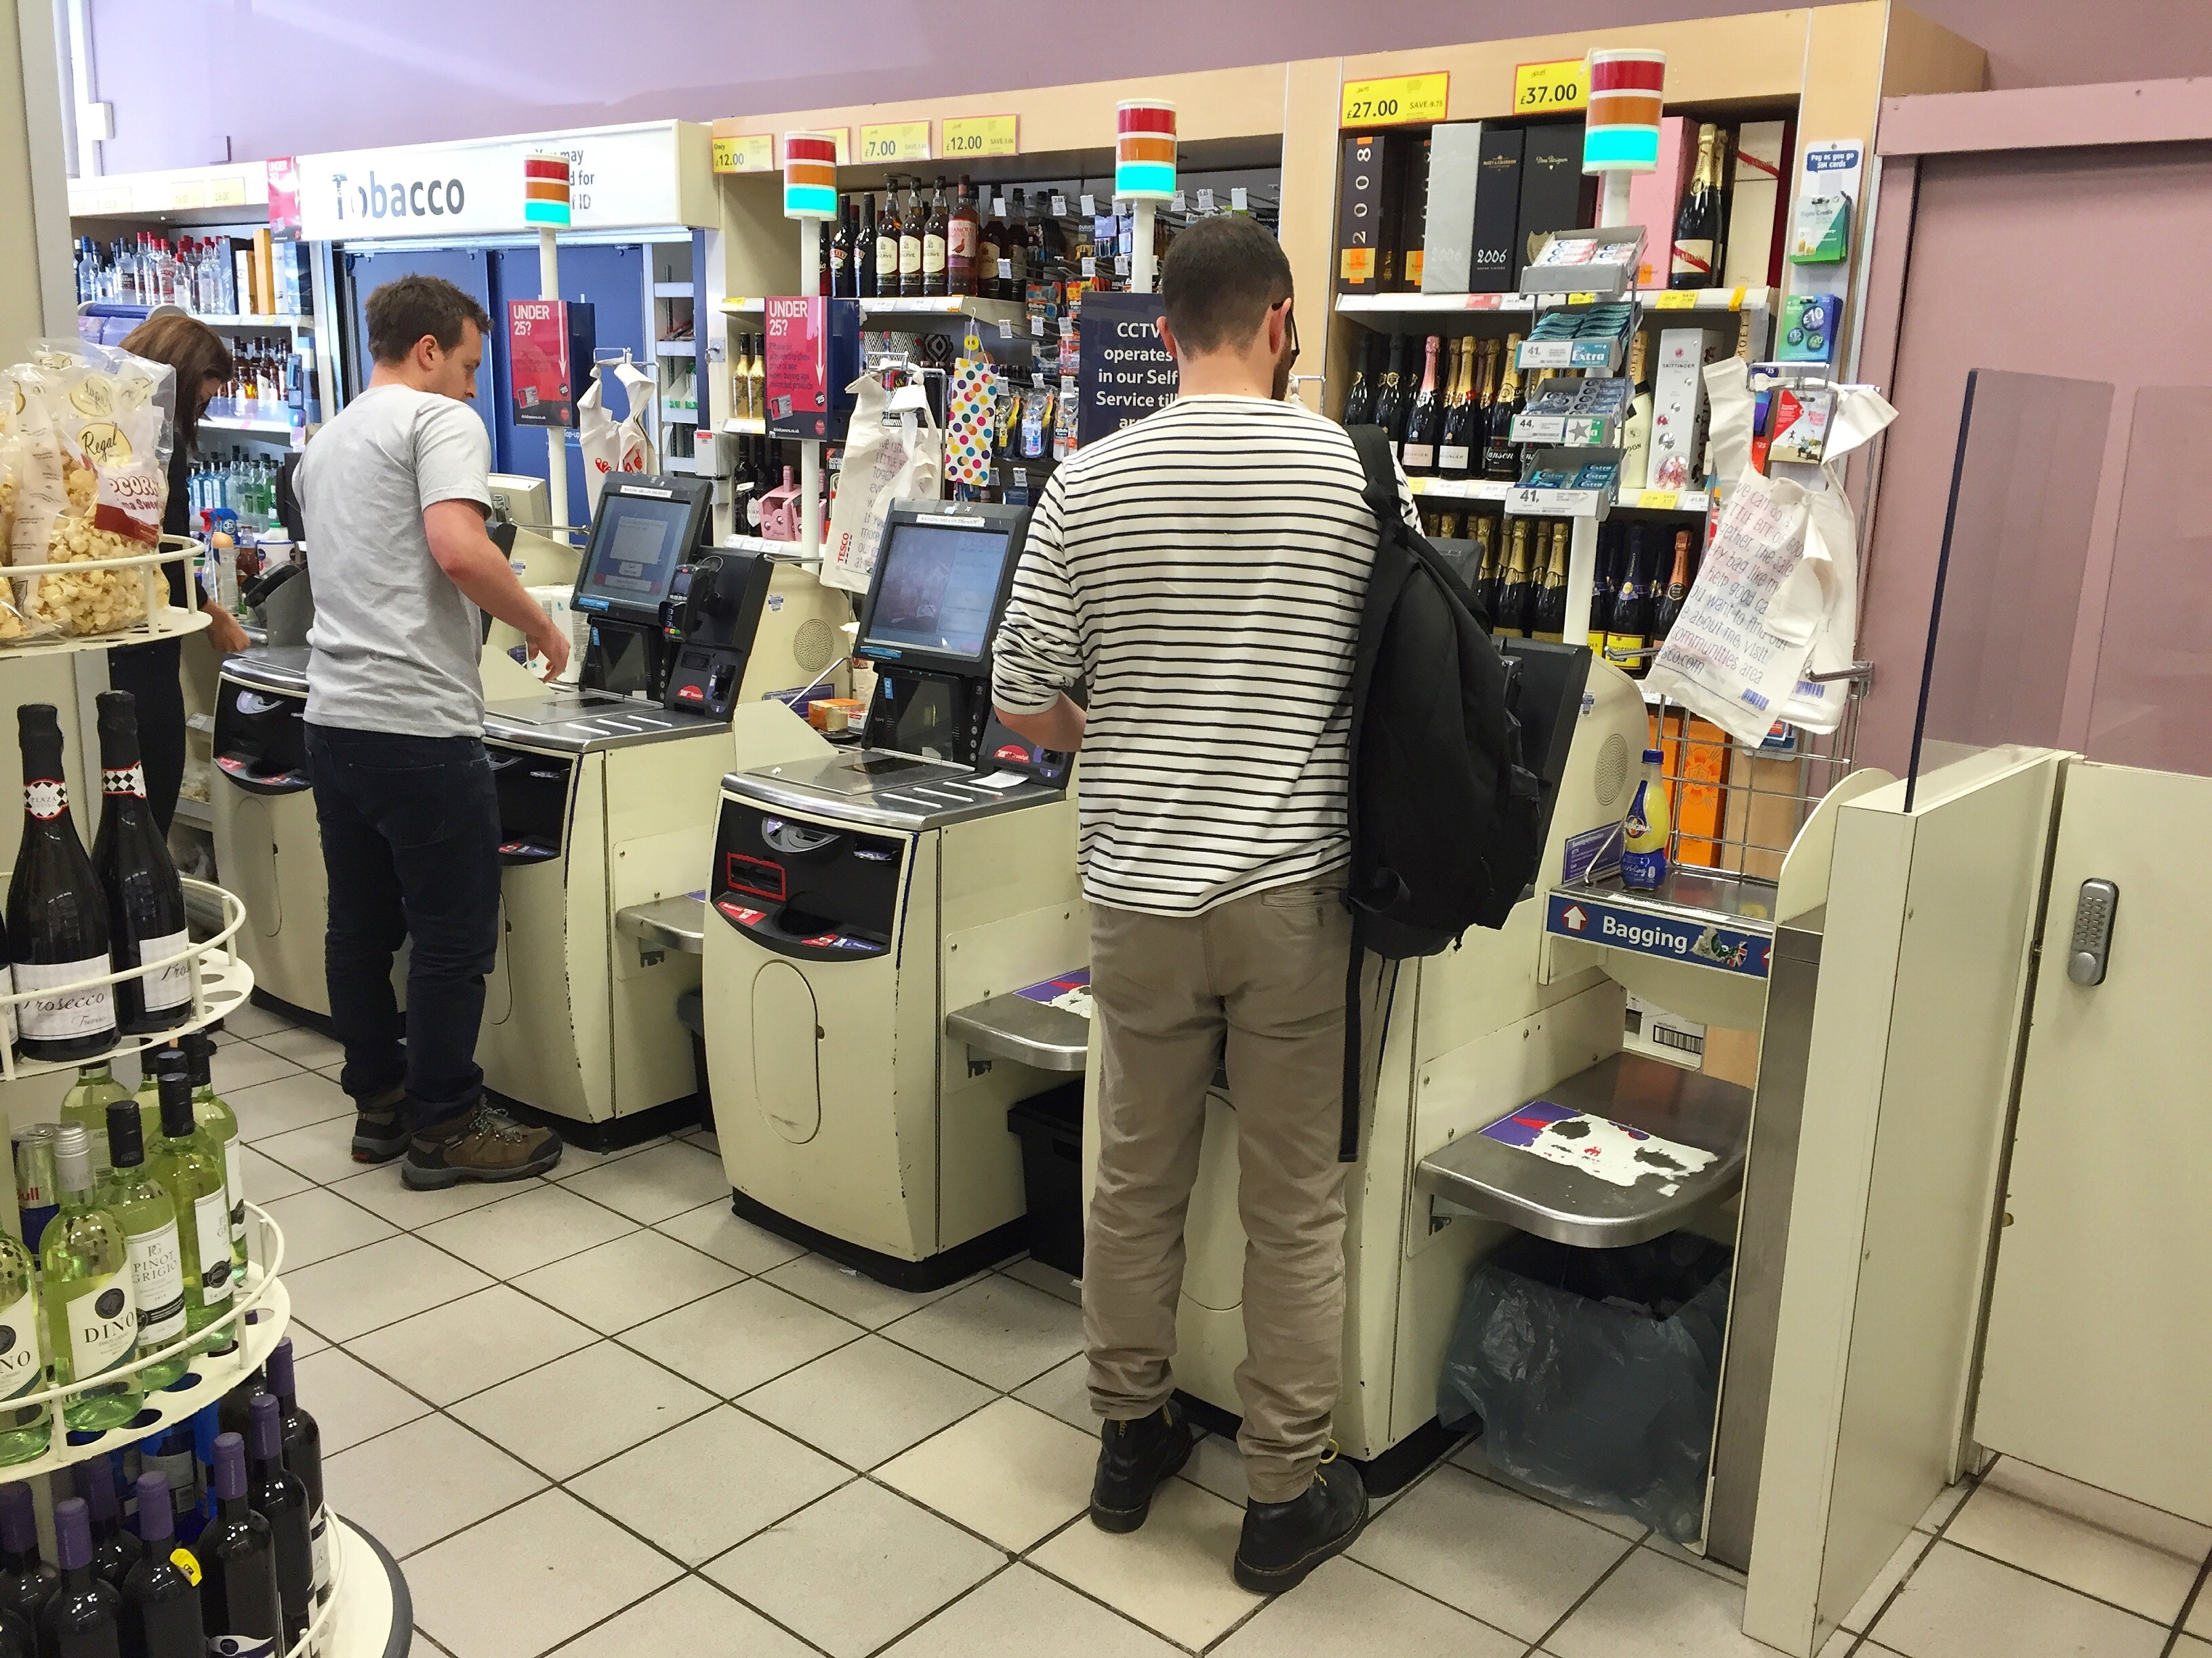 Automated Tills Put Older Shoppers Off